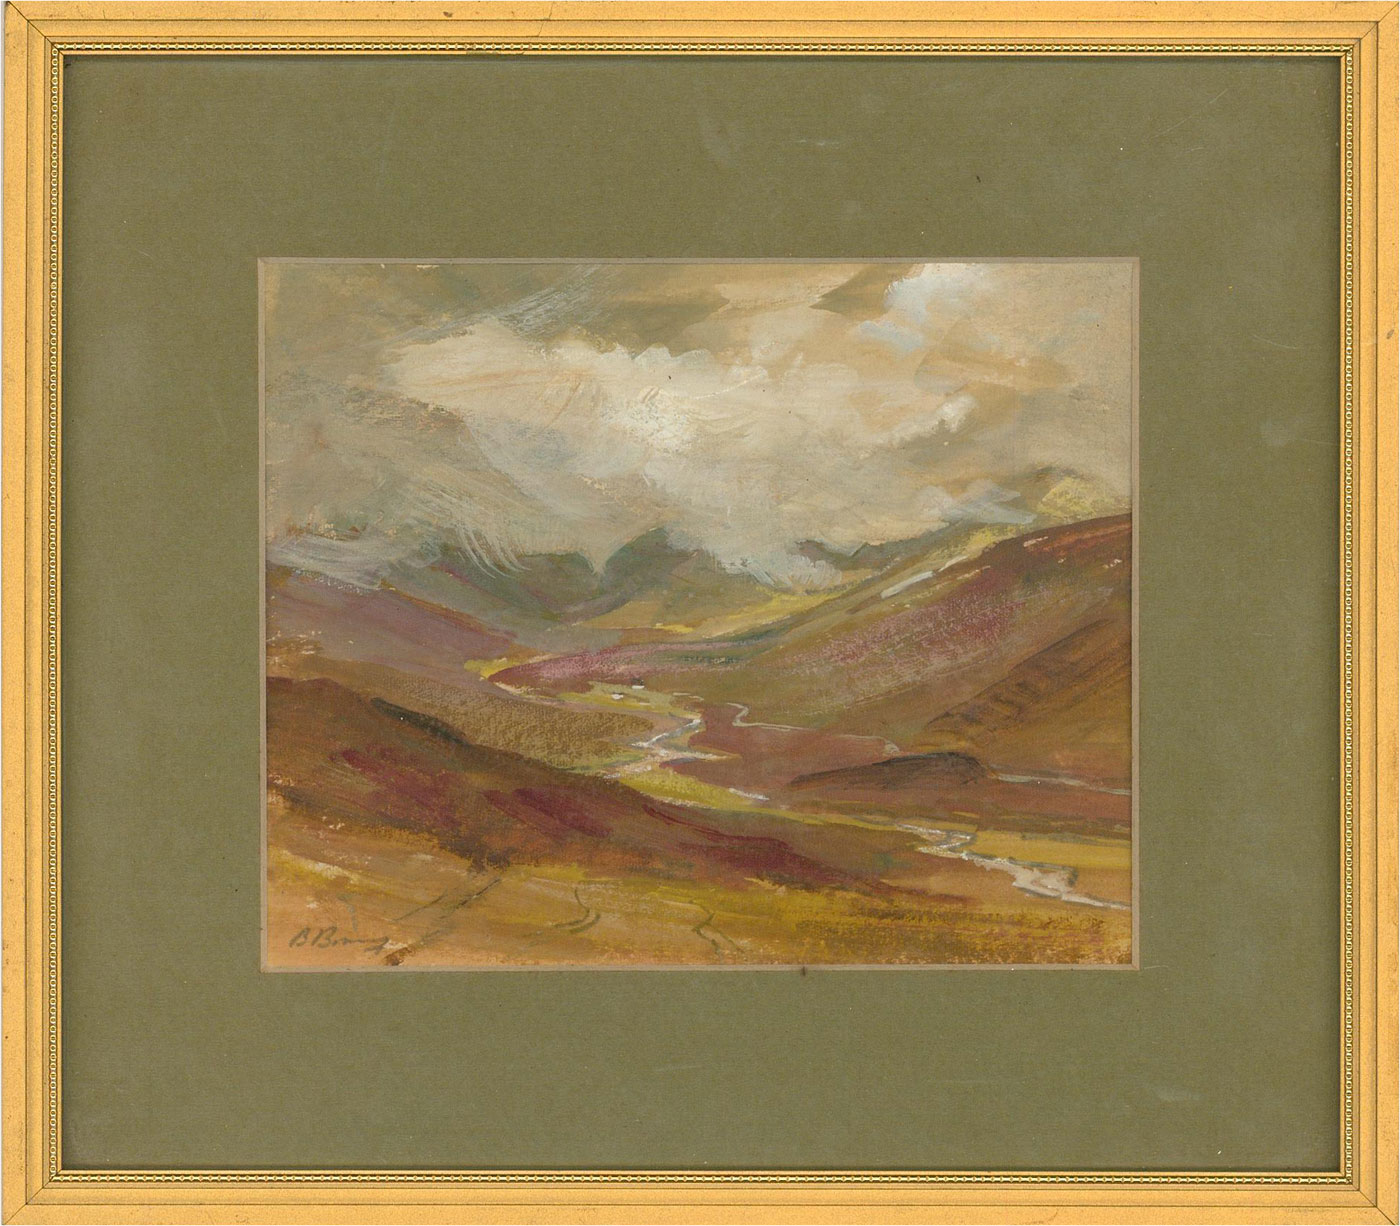 Contemporary Gouache - The Great Valley